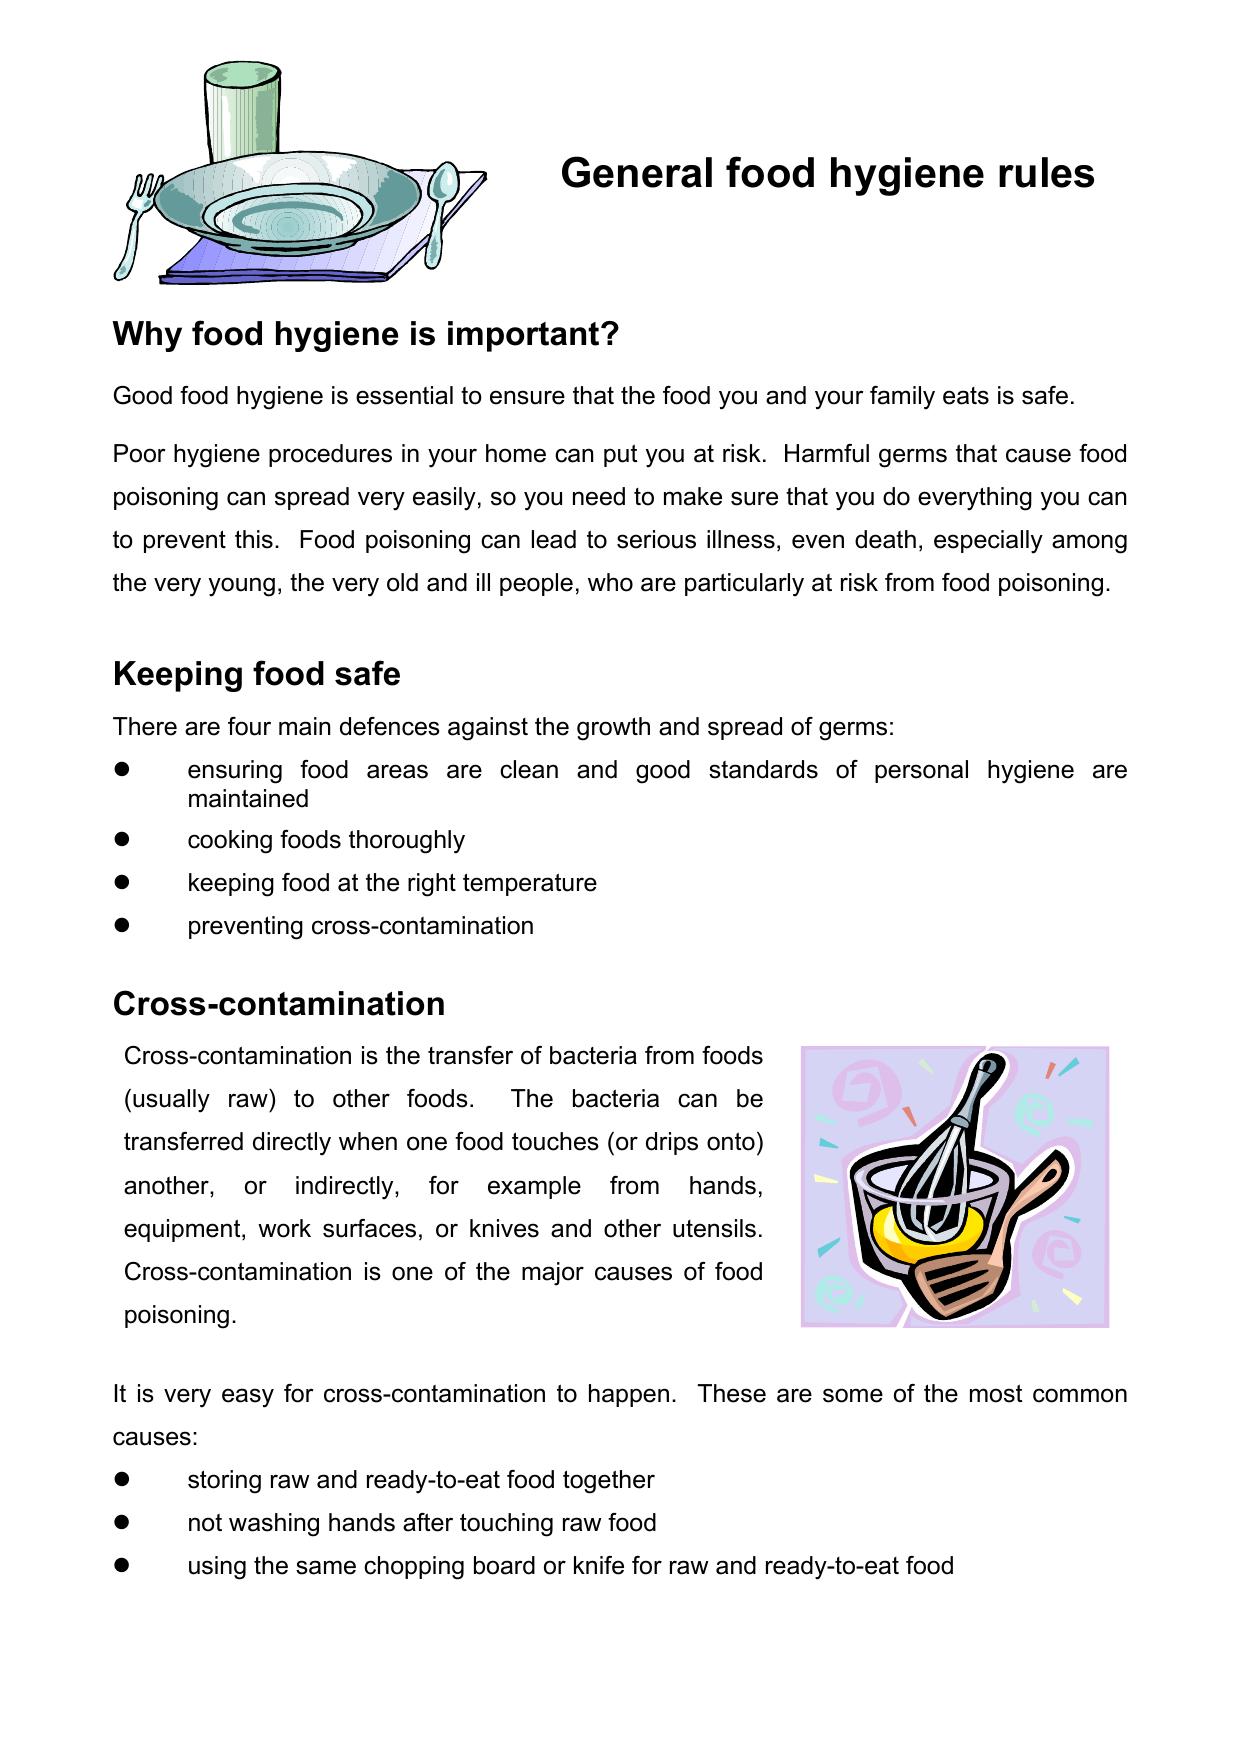 General Food Hygiene Rules